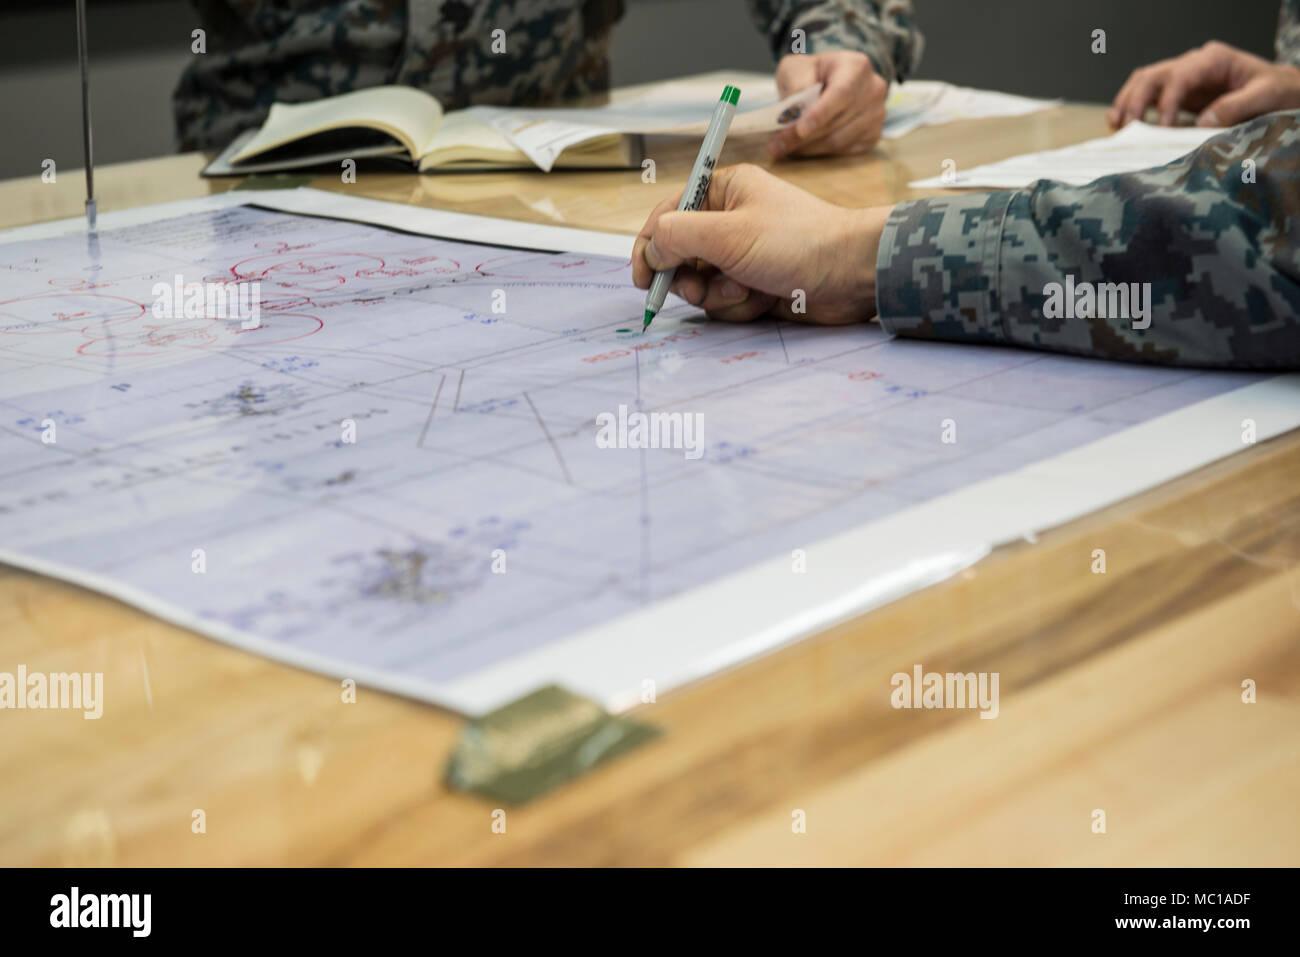 Us Air Force Bases In Japan Map.Japan Air Self Defense Force Members Identify Important Information